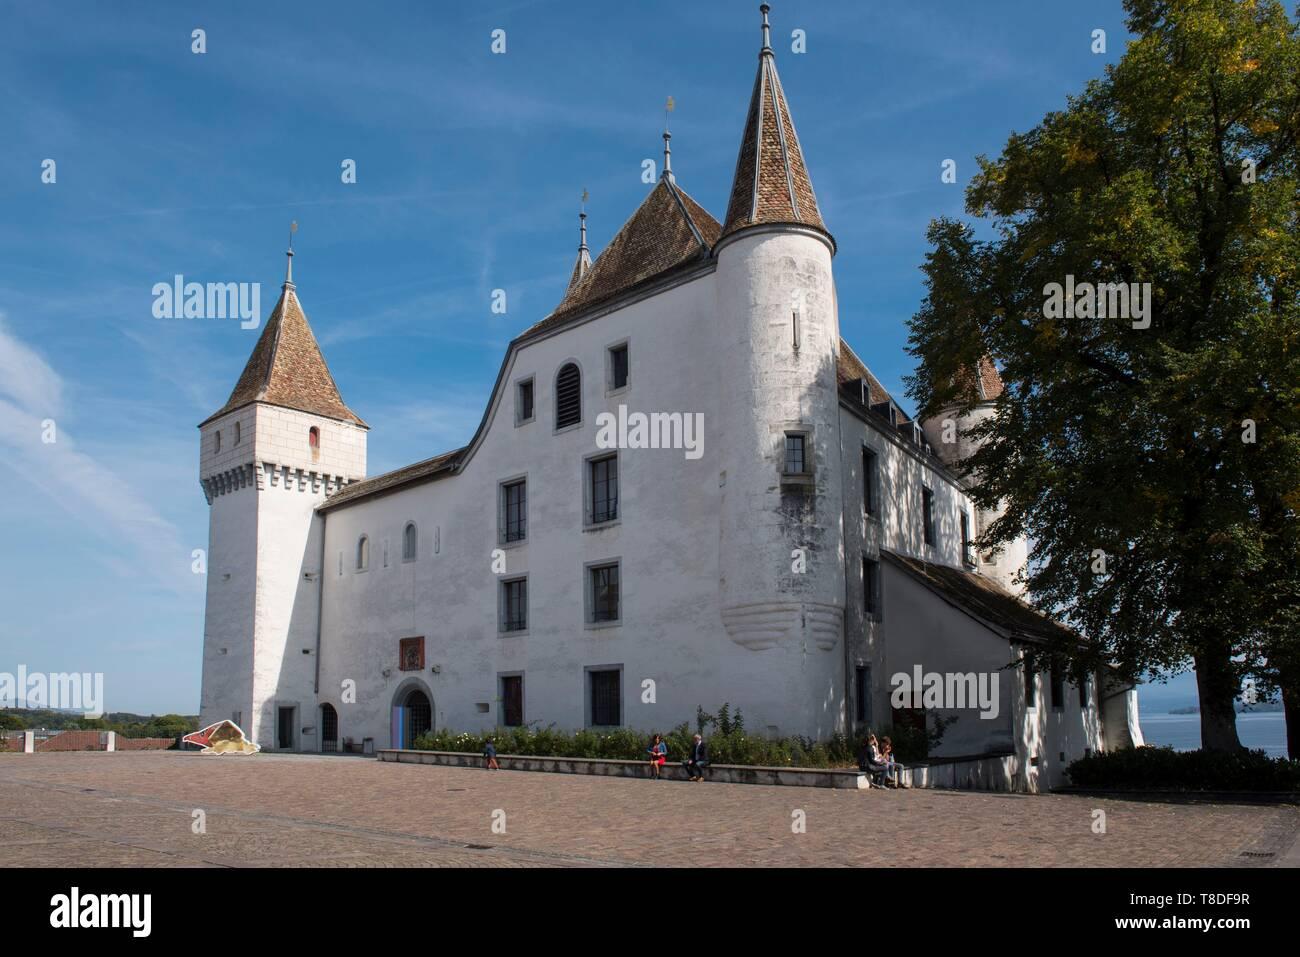 Switzerland, Canton of Vaud, Nyon, the castle - Stock Image